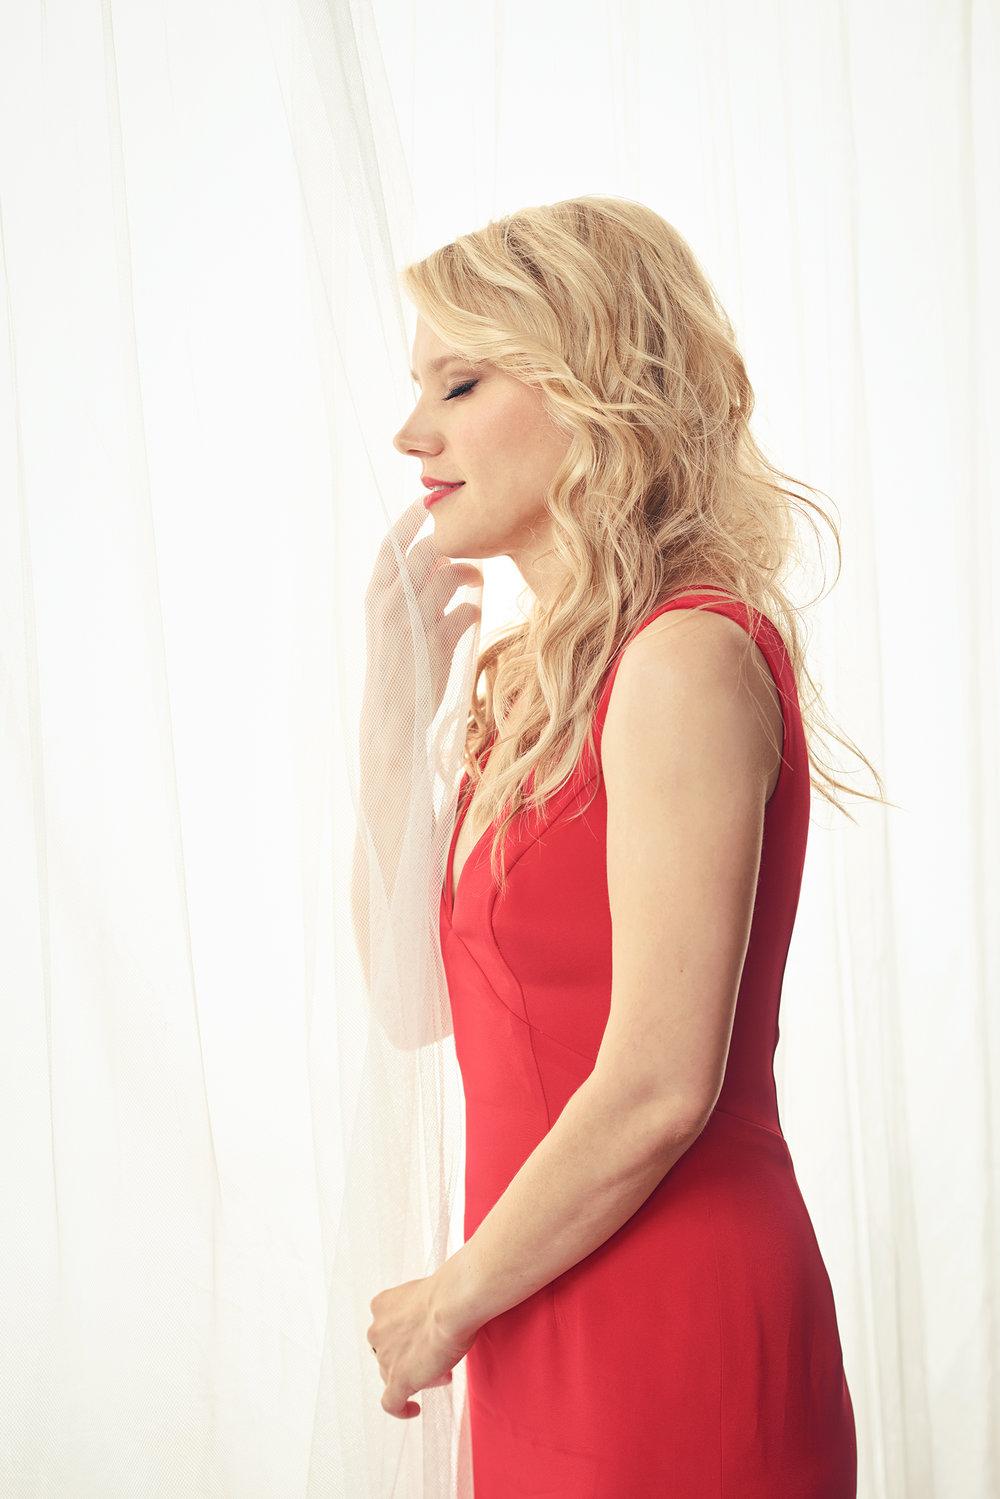 FILE_Kate McKinnon Emmys 201738123.jpg